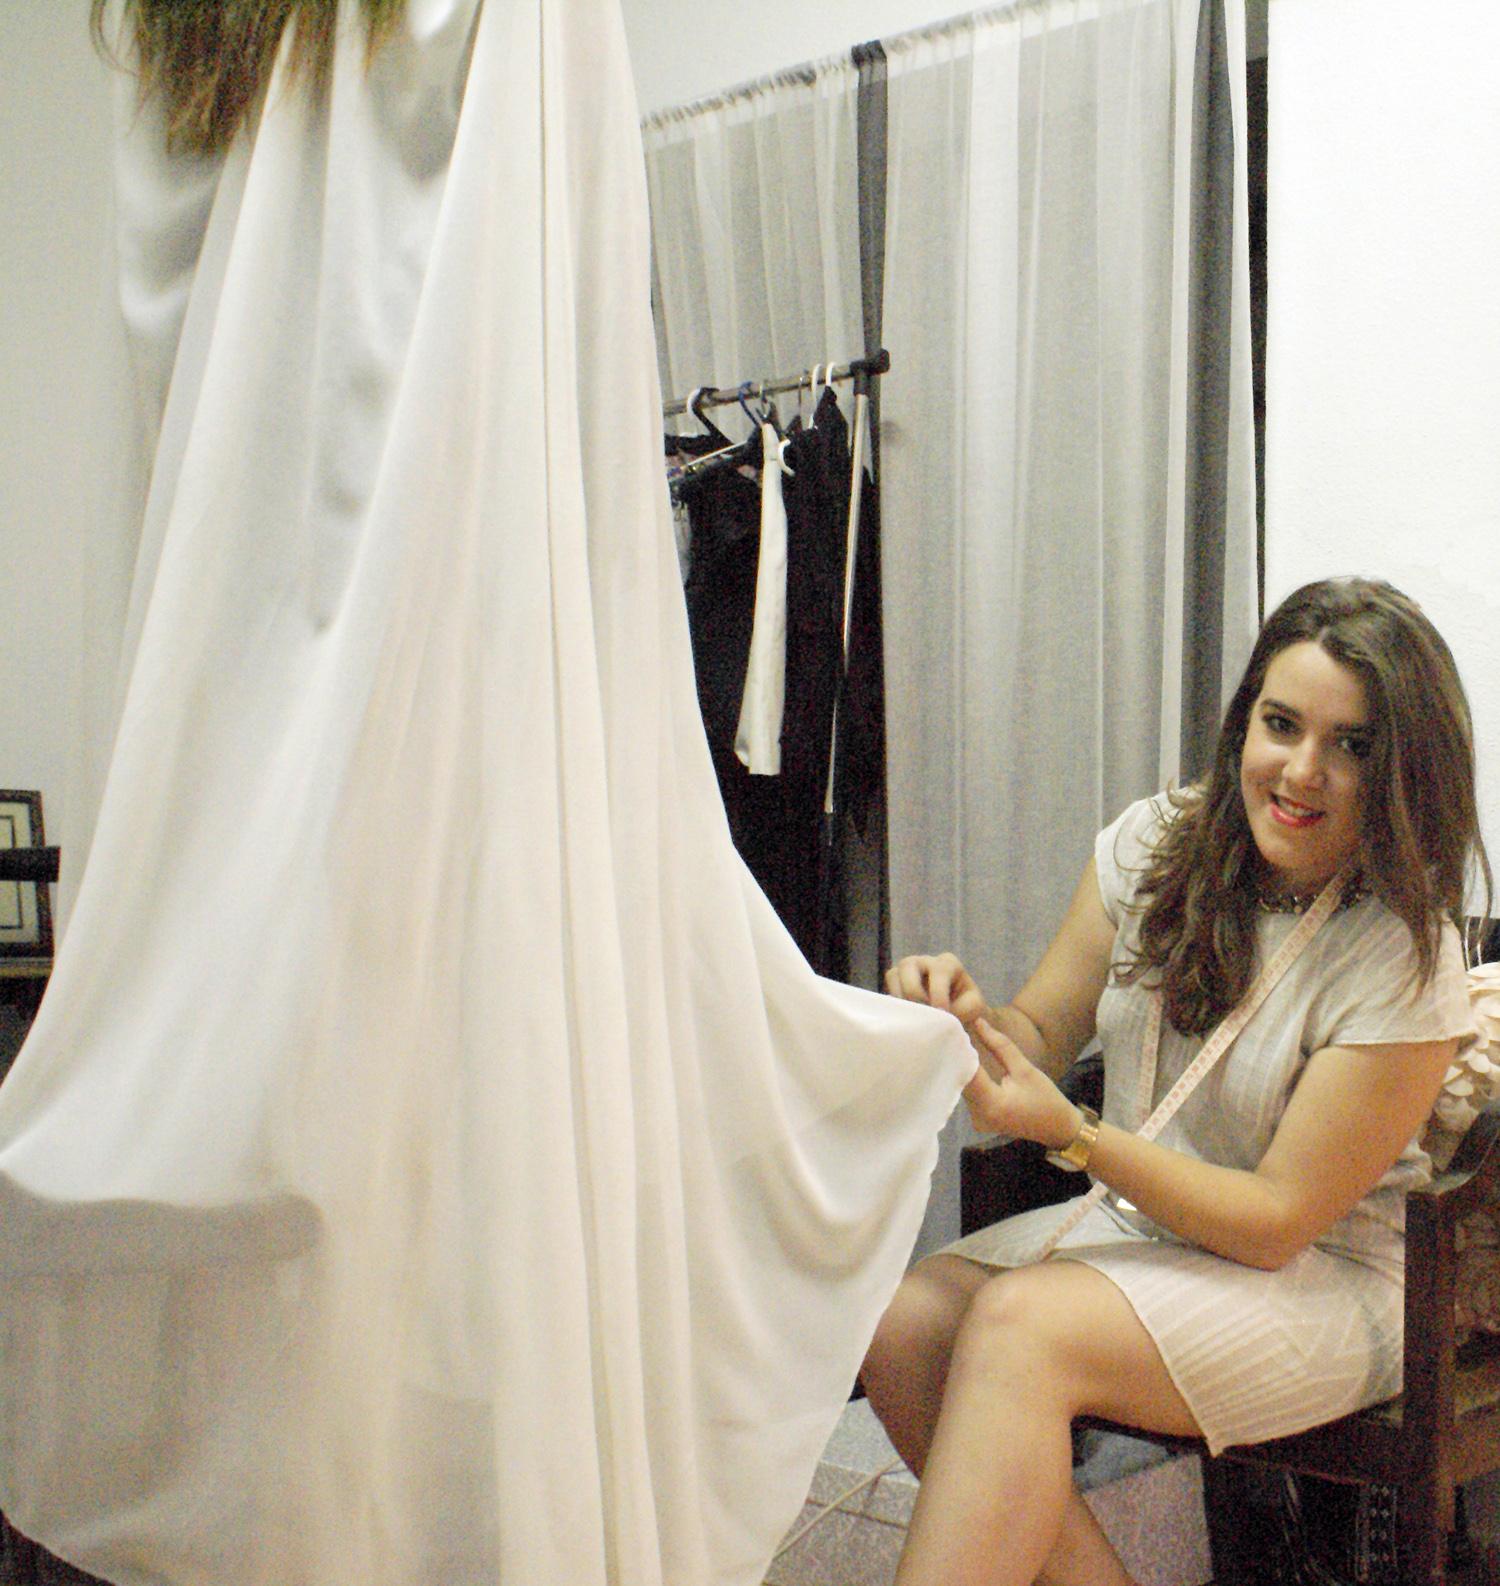 Sandra trabajando en su taller